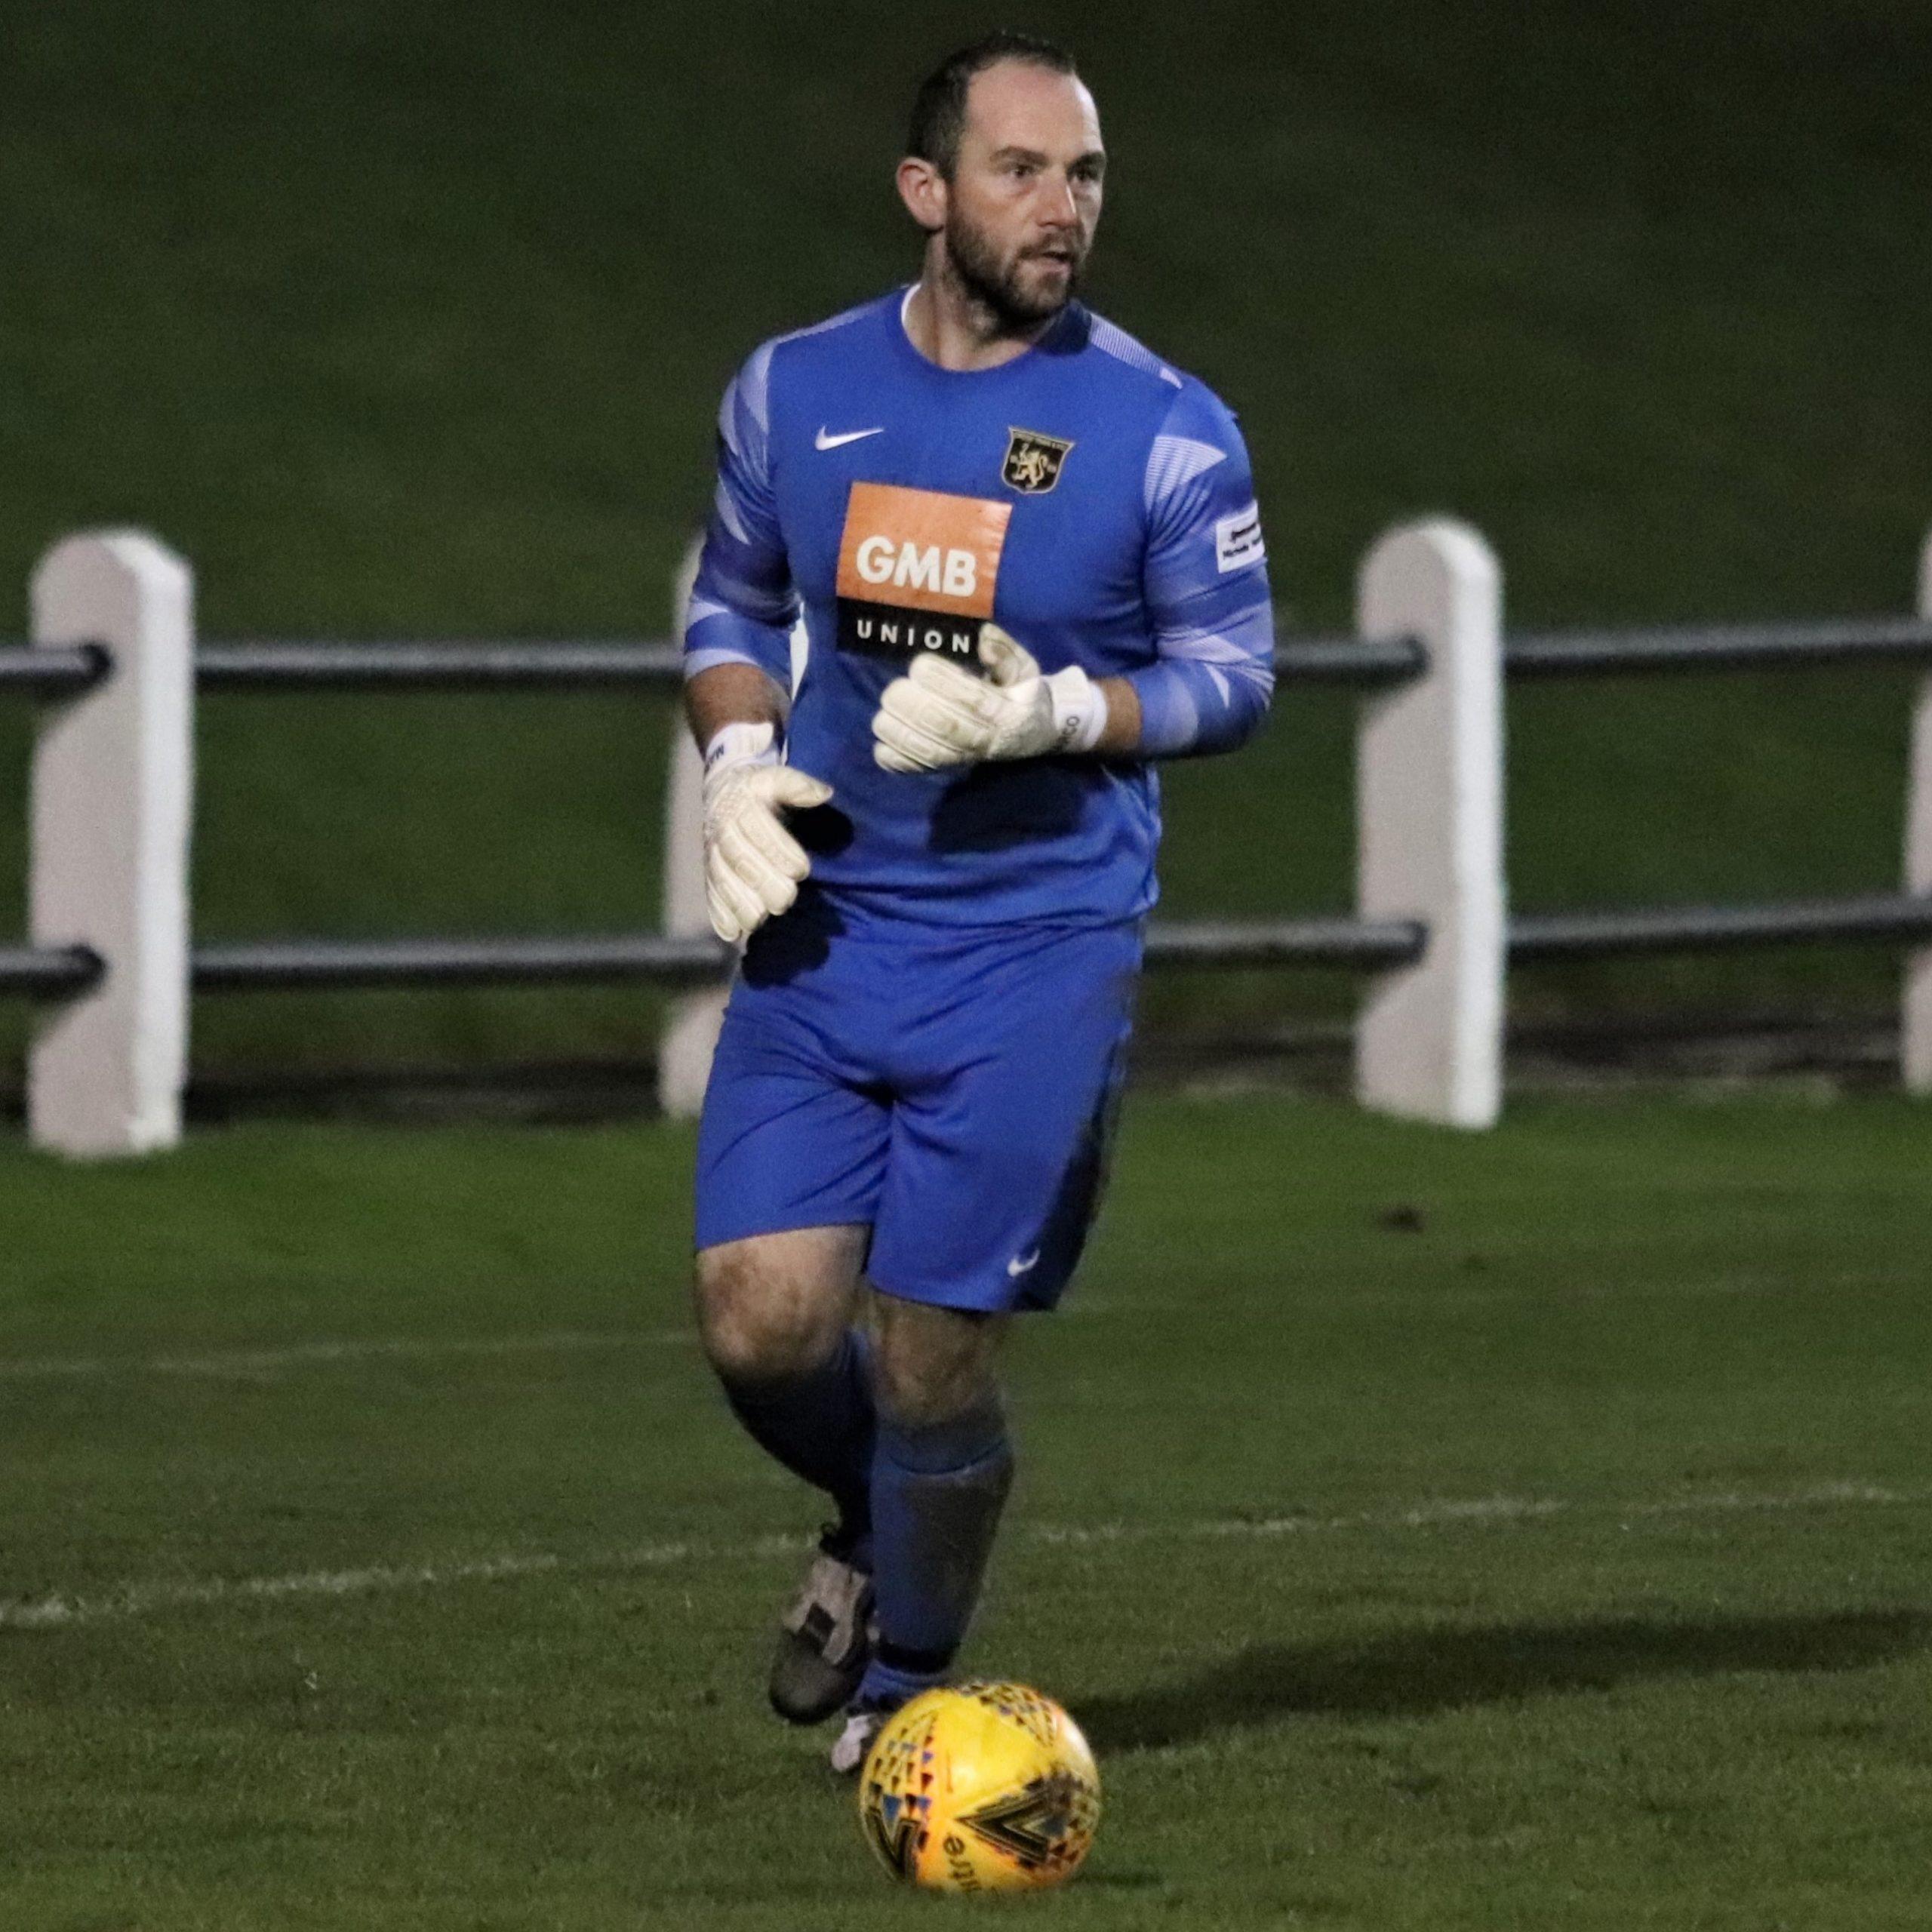 Marc Boughey - Goalkeeper